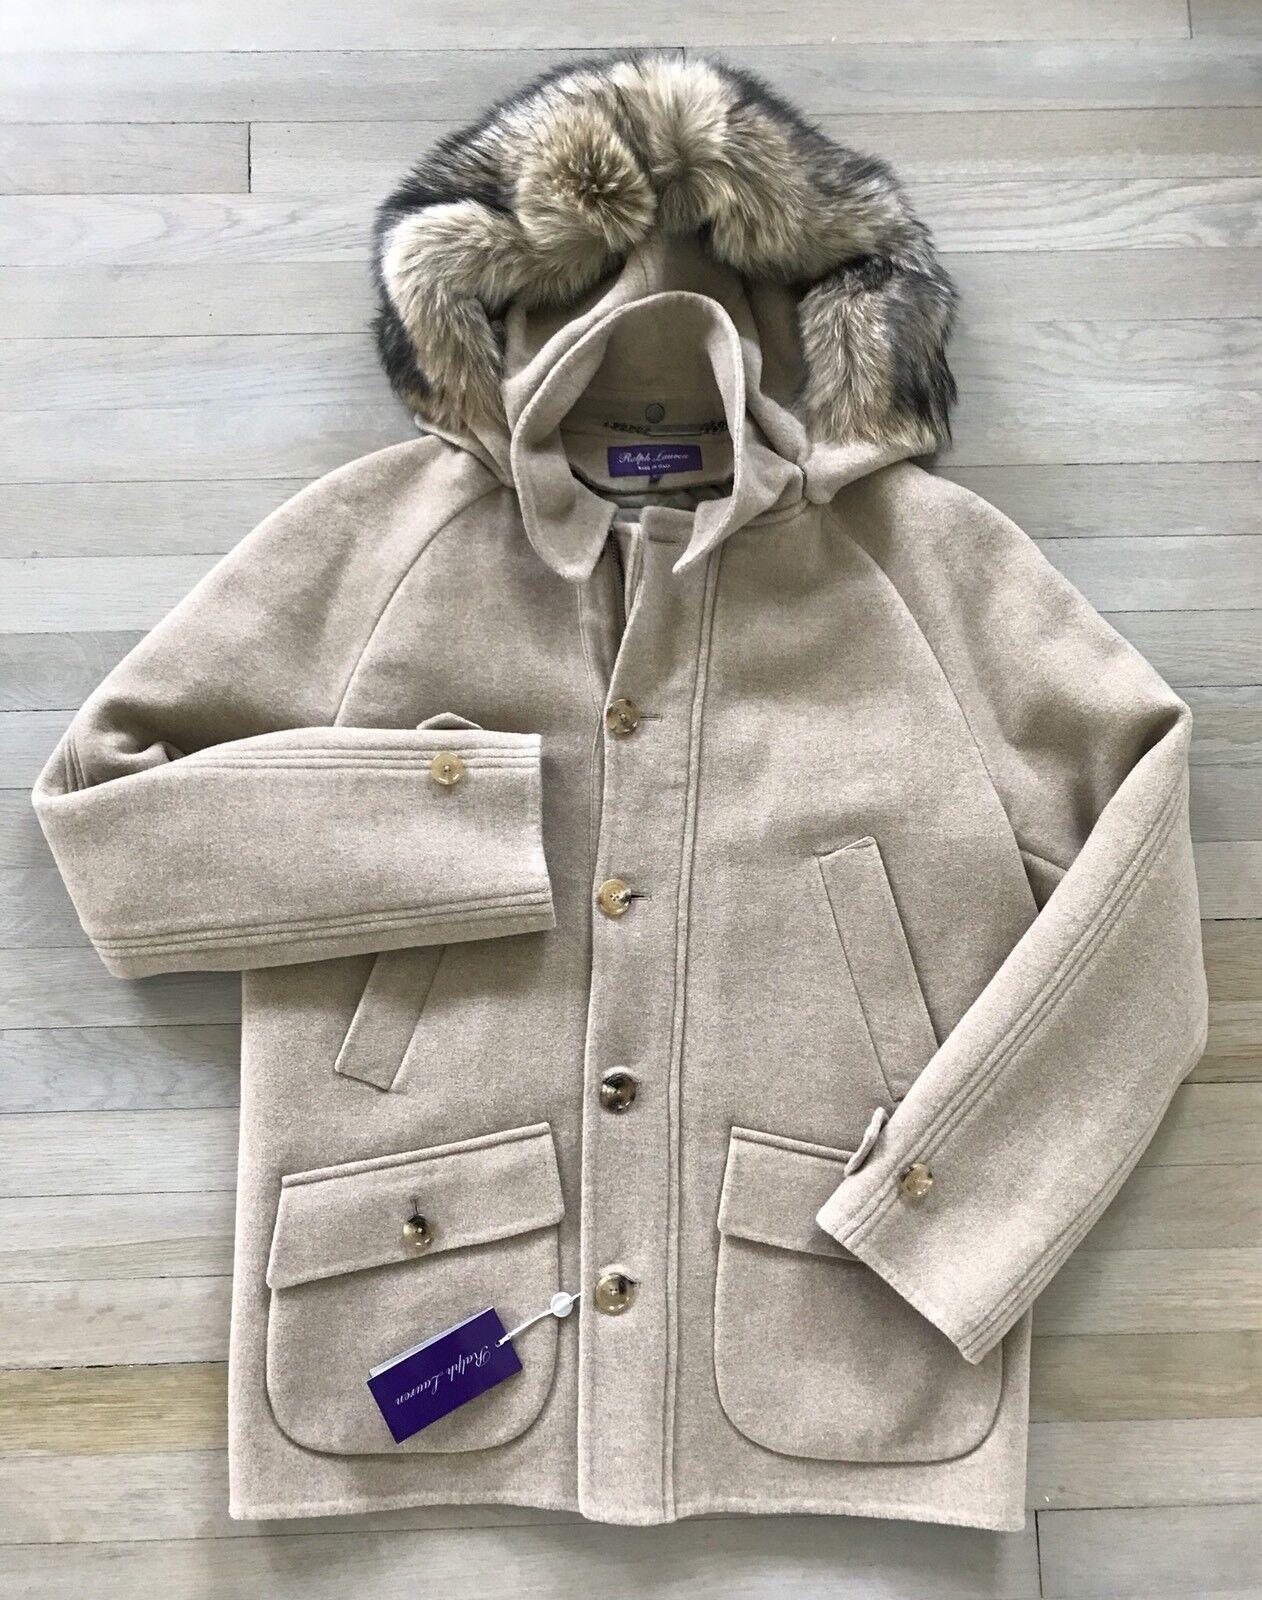 4,000 Ralph Lauren lila Label 3-in-1 Wool and Fur Parka Größe L Made in